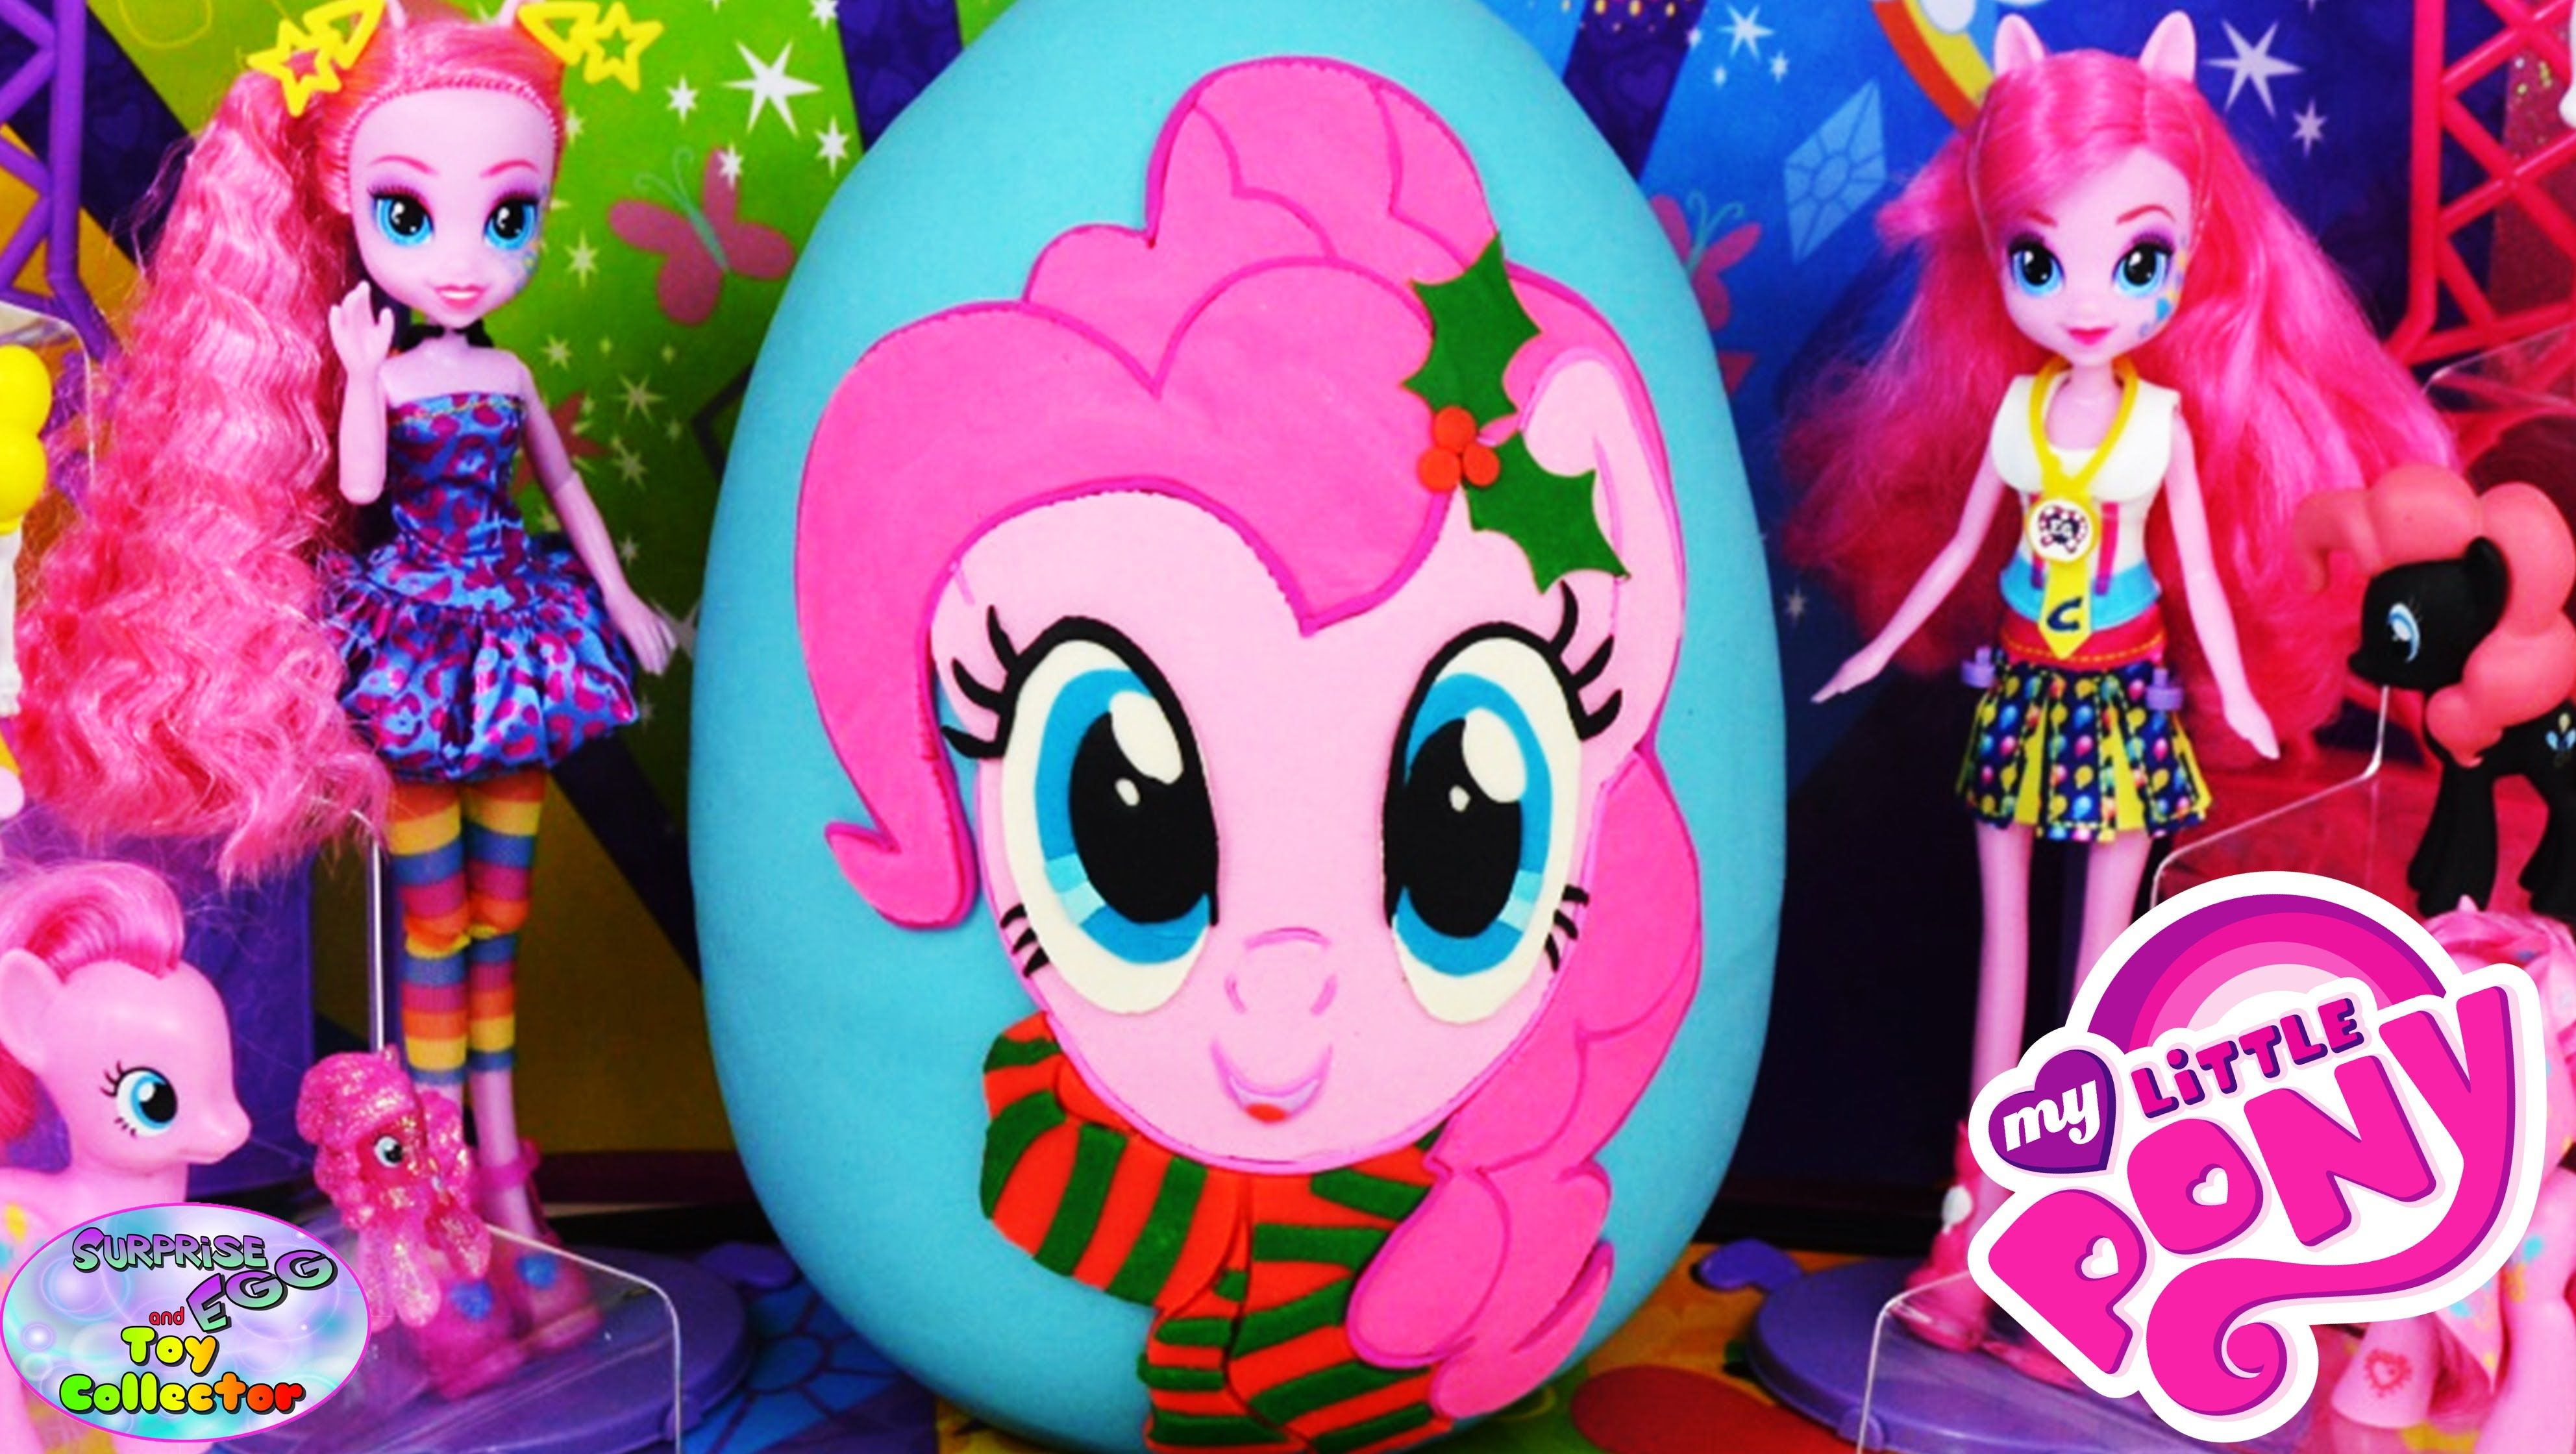 40ed3f638 My Little Pony Giant Play Doh Surprise Egg Pinkie Pie Christmas MLP SETC # MyLittlePony #